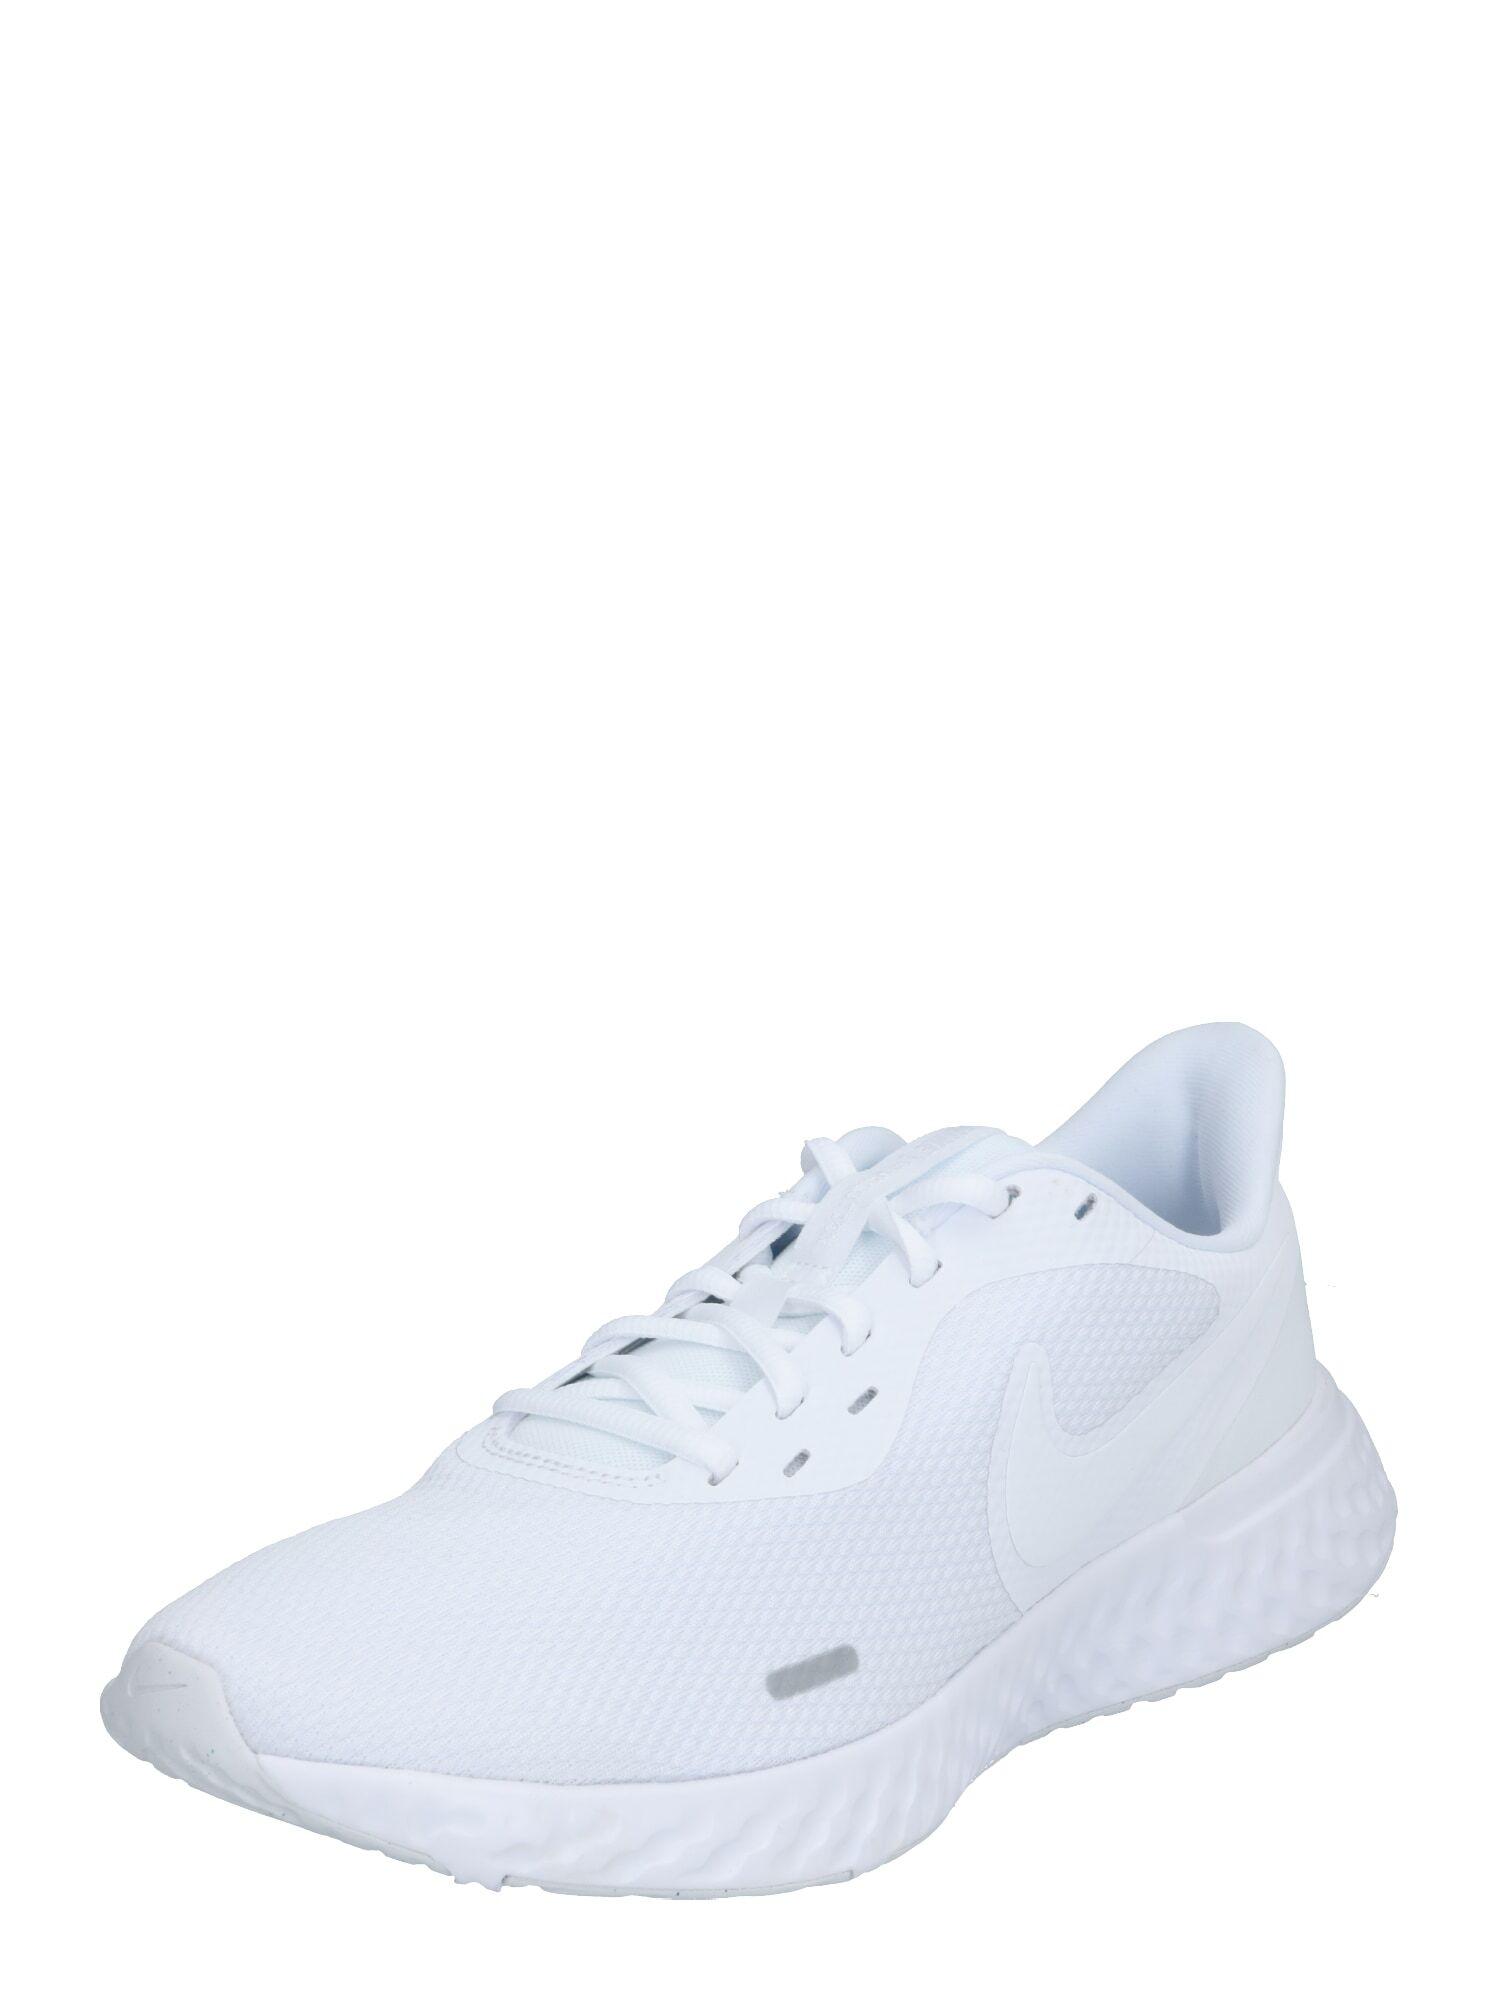 NIKE Chaussure de course 'Revolution 5'  - Blanc - Taille: 7.5 - male